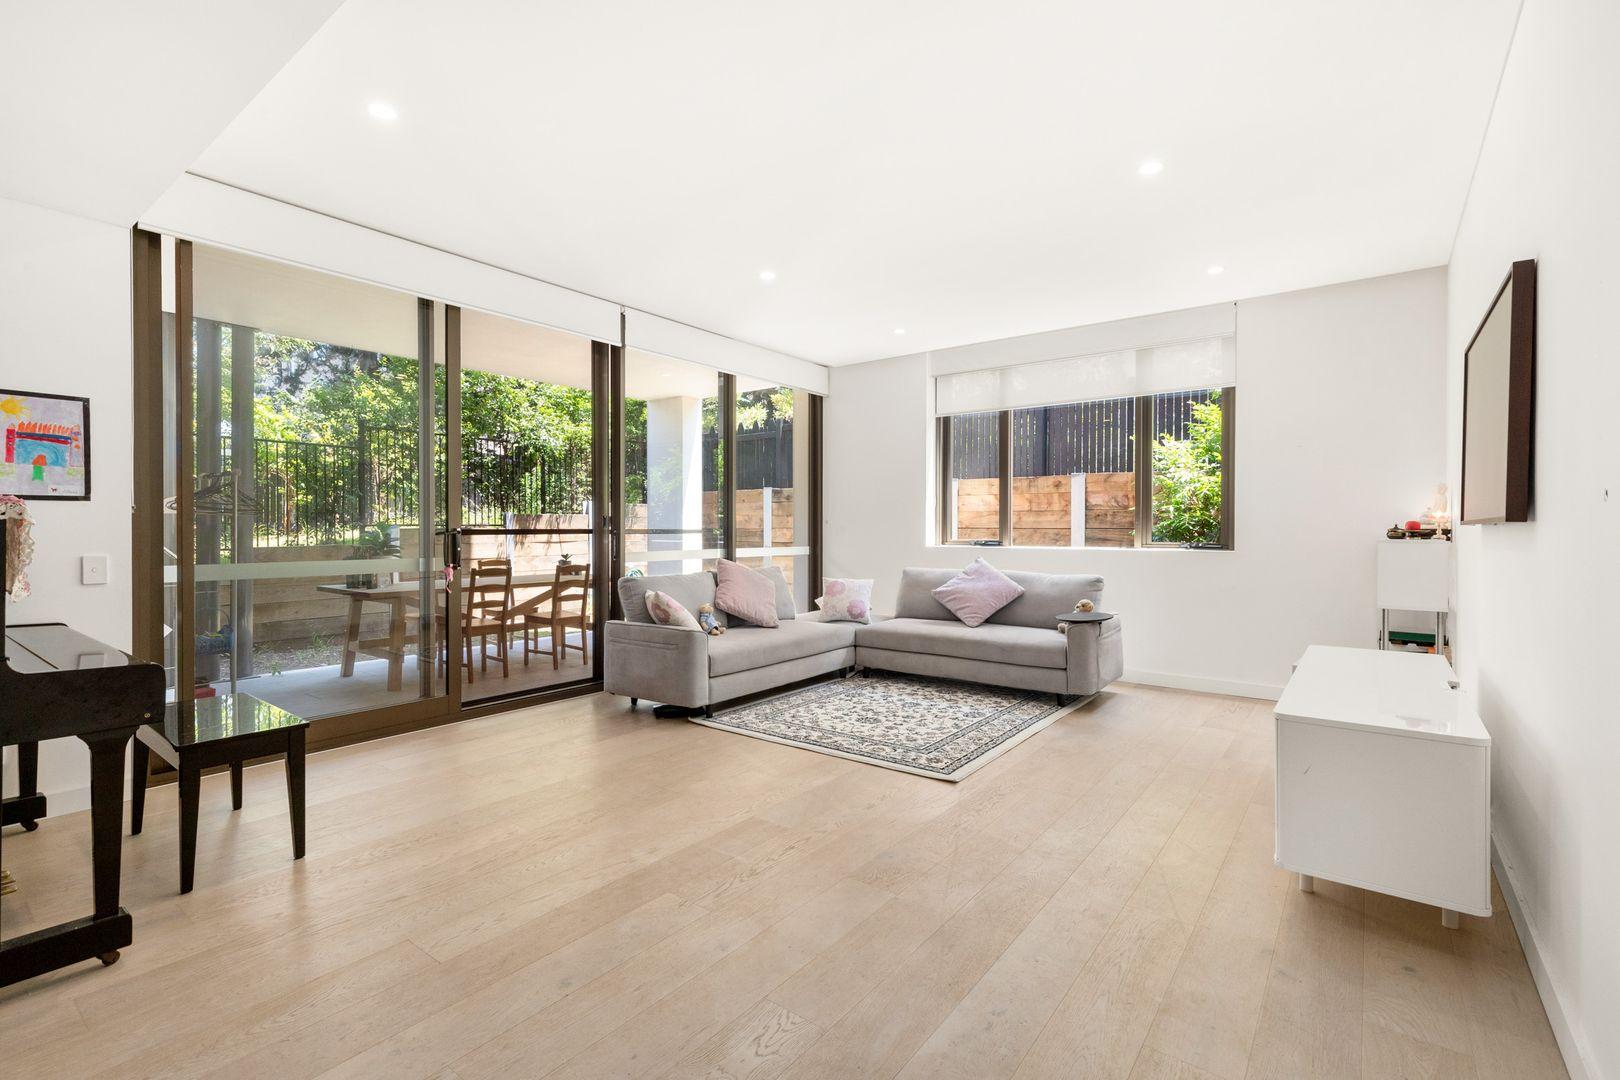 005/11 Victoria  Street, Roseville NSW 2069, Image 0